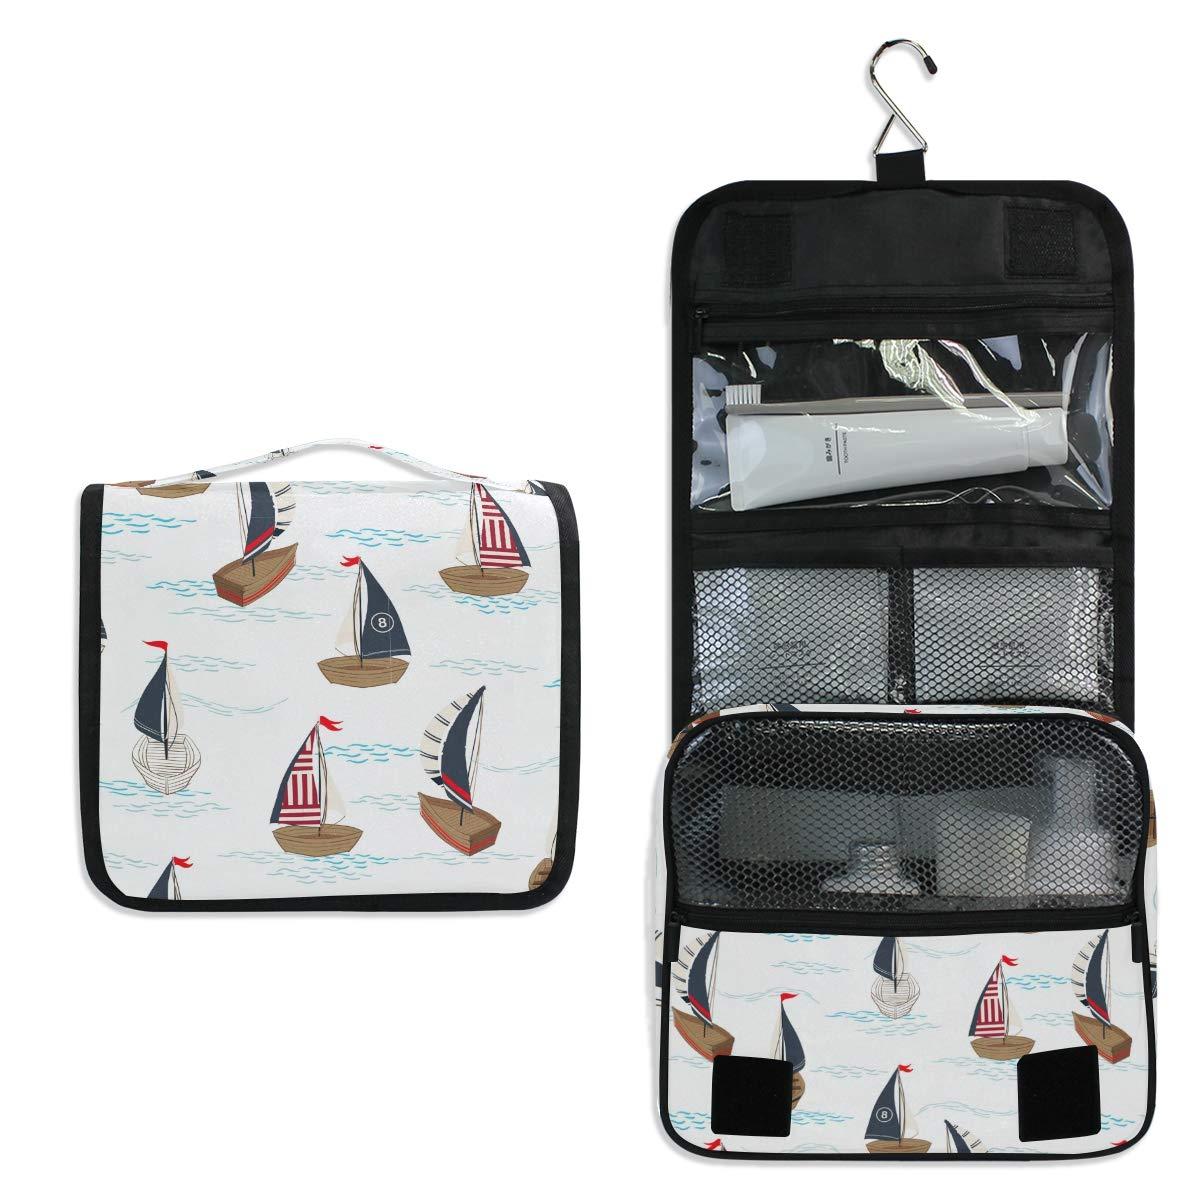 Toiletry Bag Travel Bag Hanging Hook - Summer Boat Beach Waterproof Cosmetic Bag Portable Makeup Pouch for Toiletries Bathroom